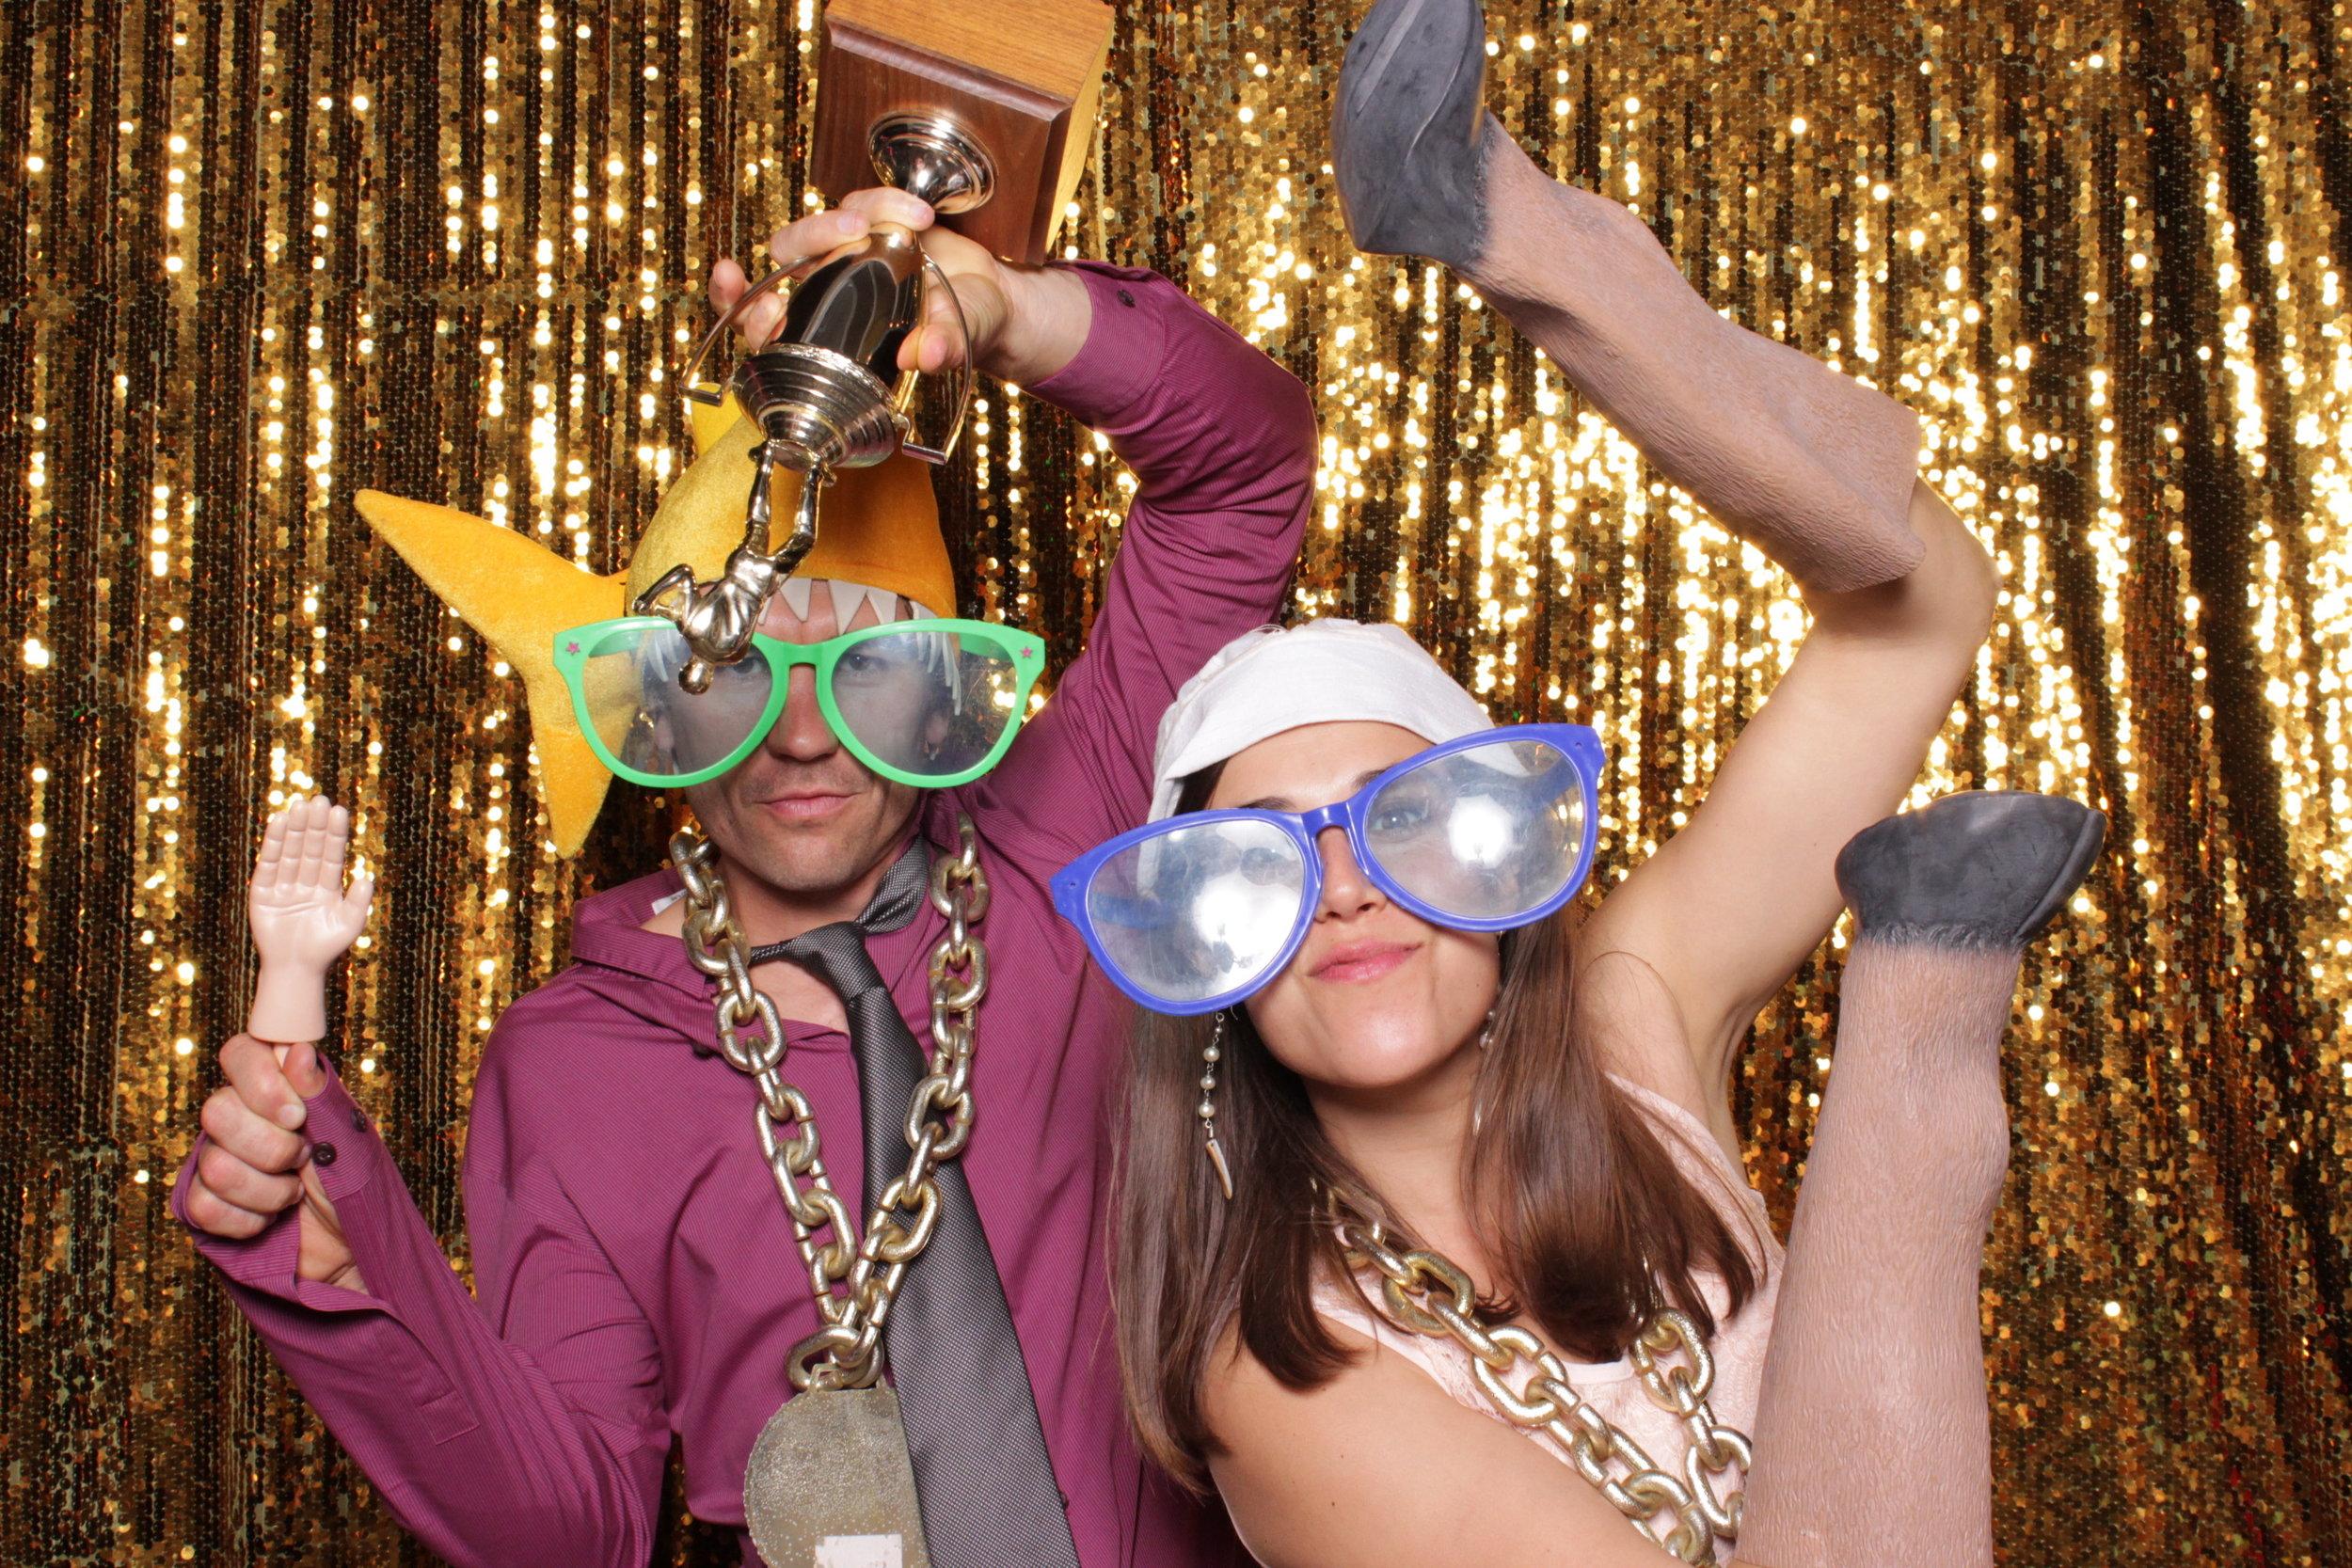 chico-wedding-photo-booth-rental-fun-reception-props